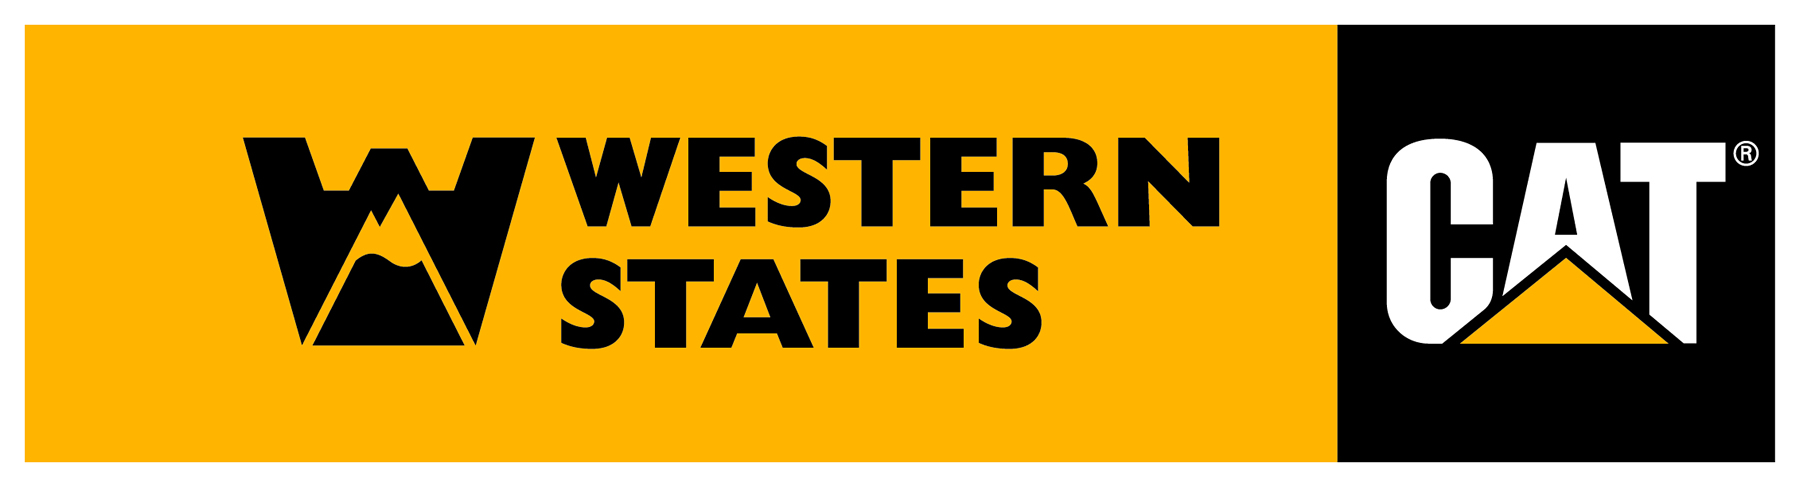 Western States Cat logo.jpg